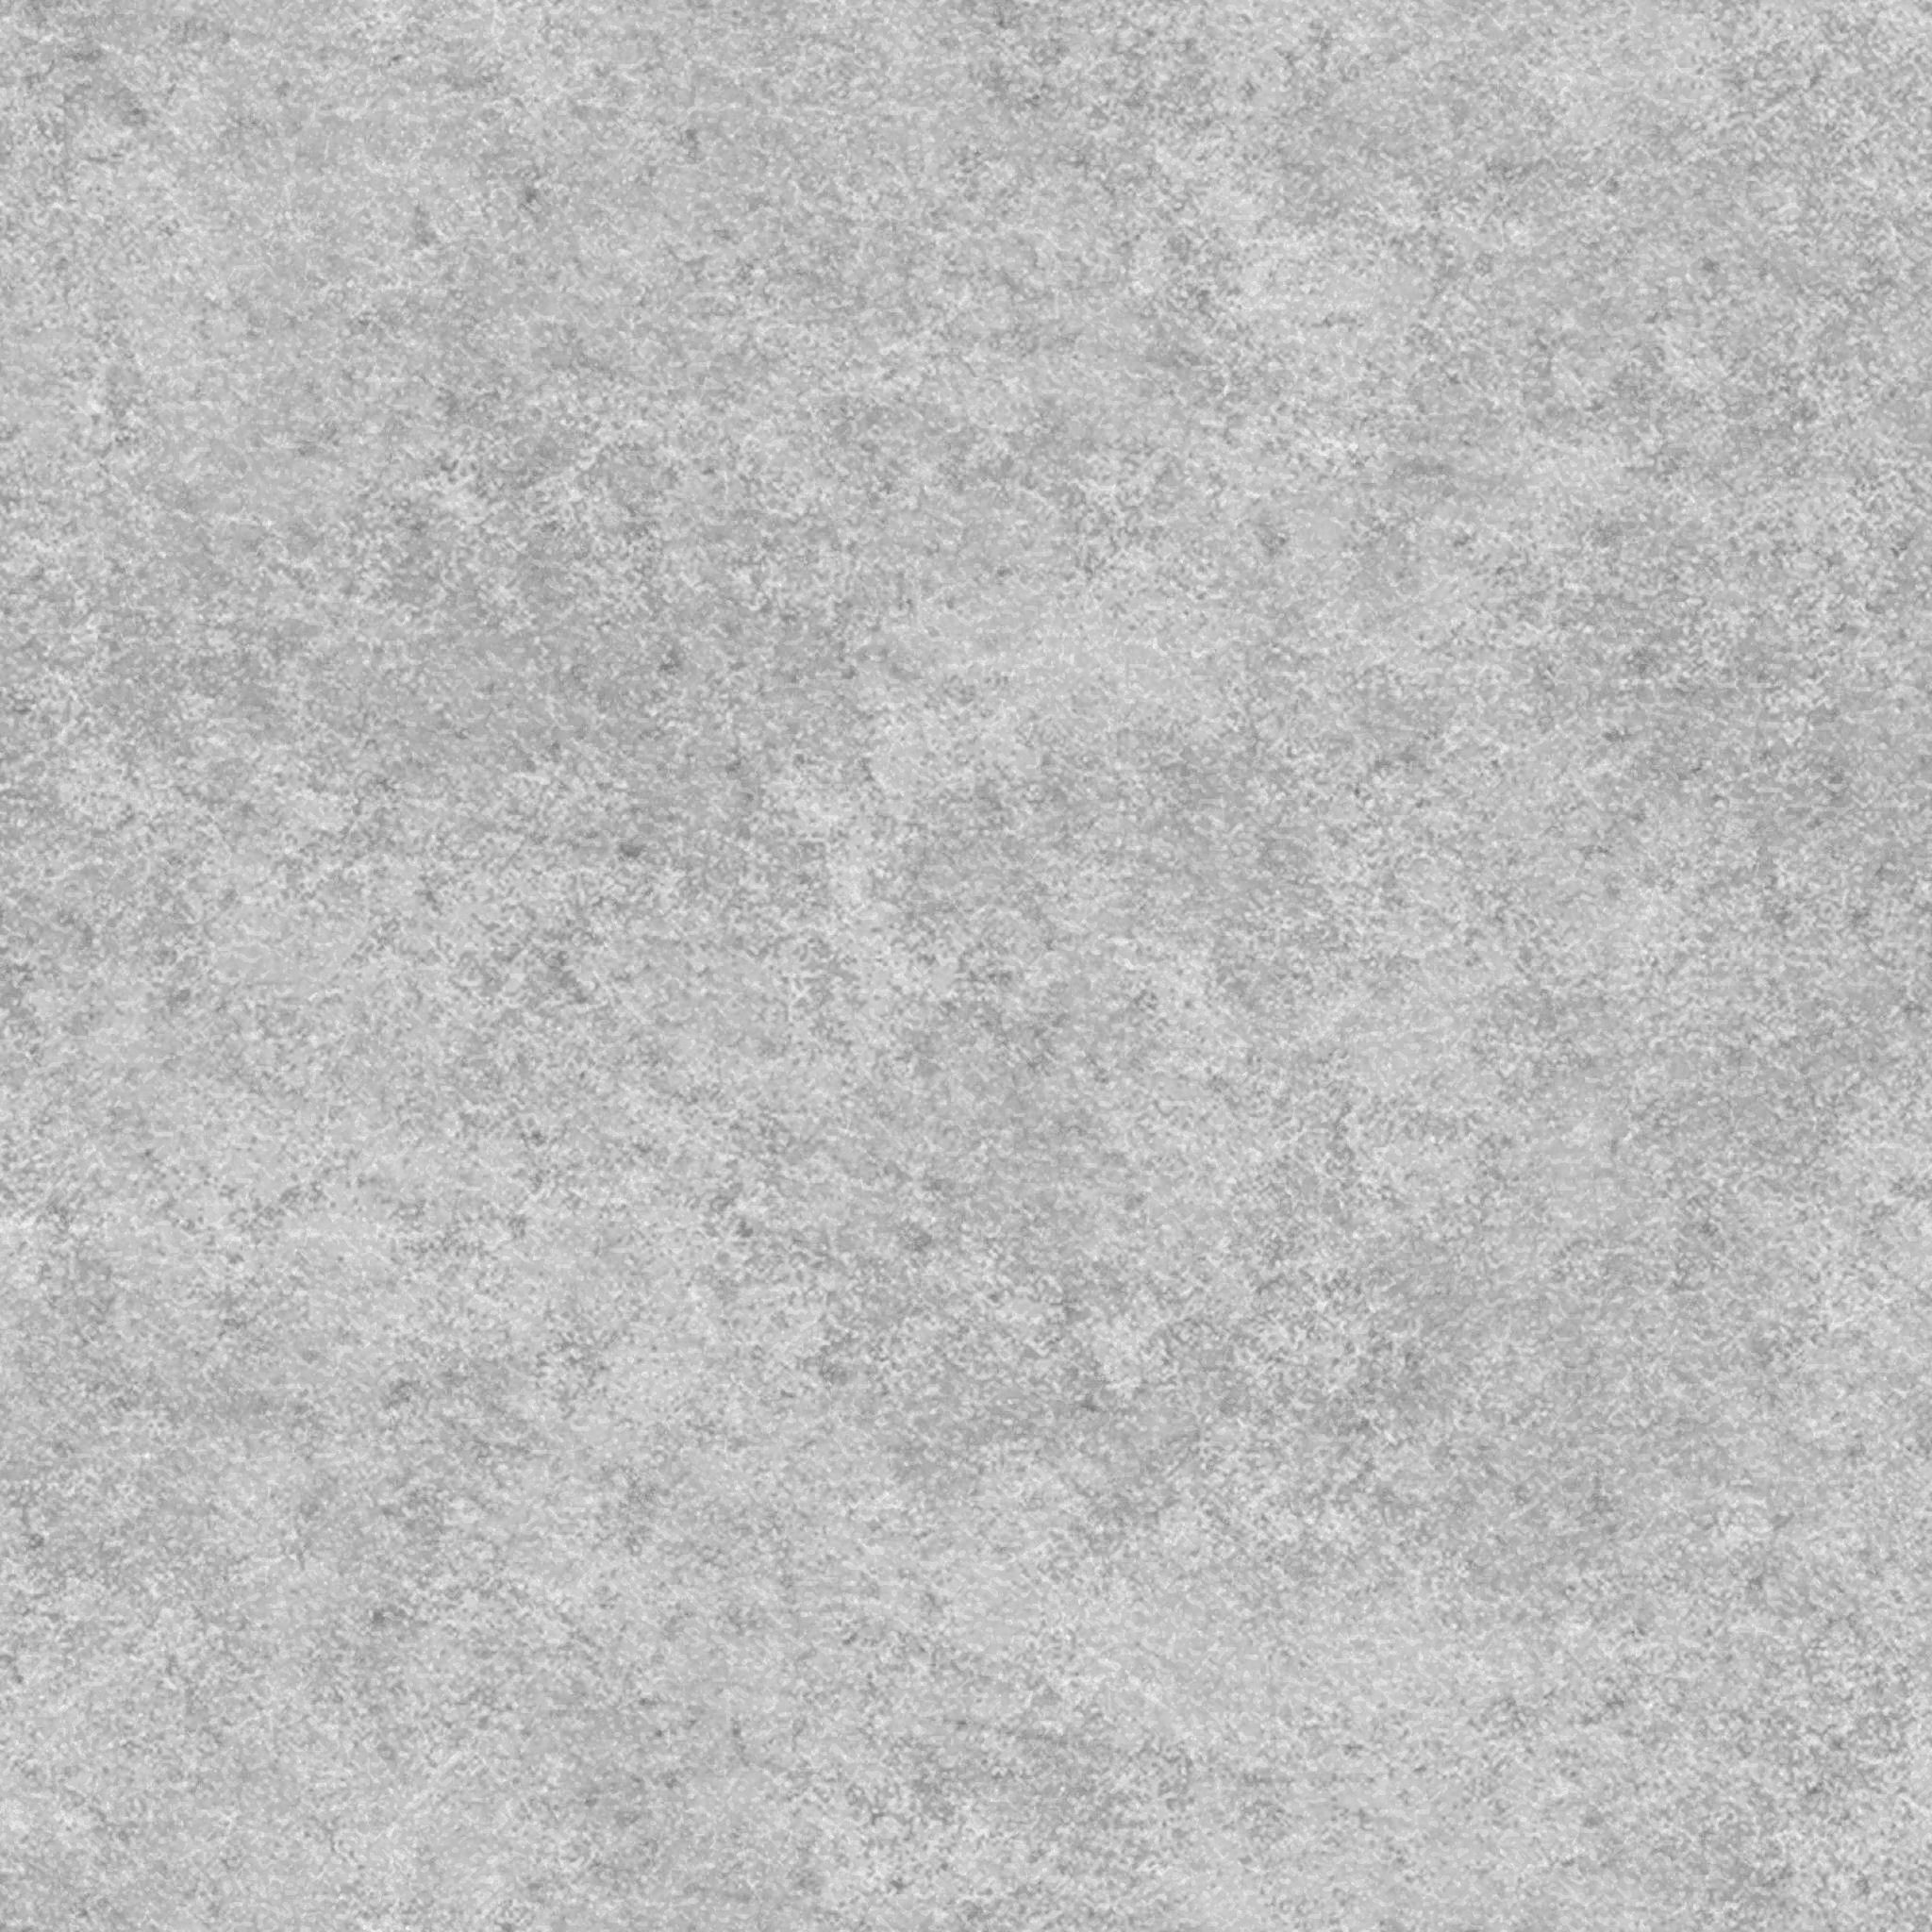 Cemento pulido gris claro pisos pinterest cemento for Piso cemento pulido blanco